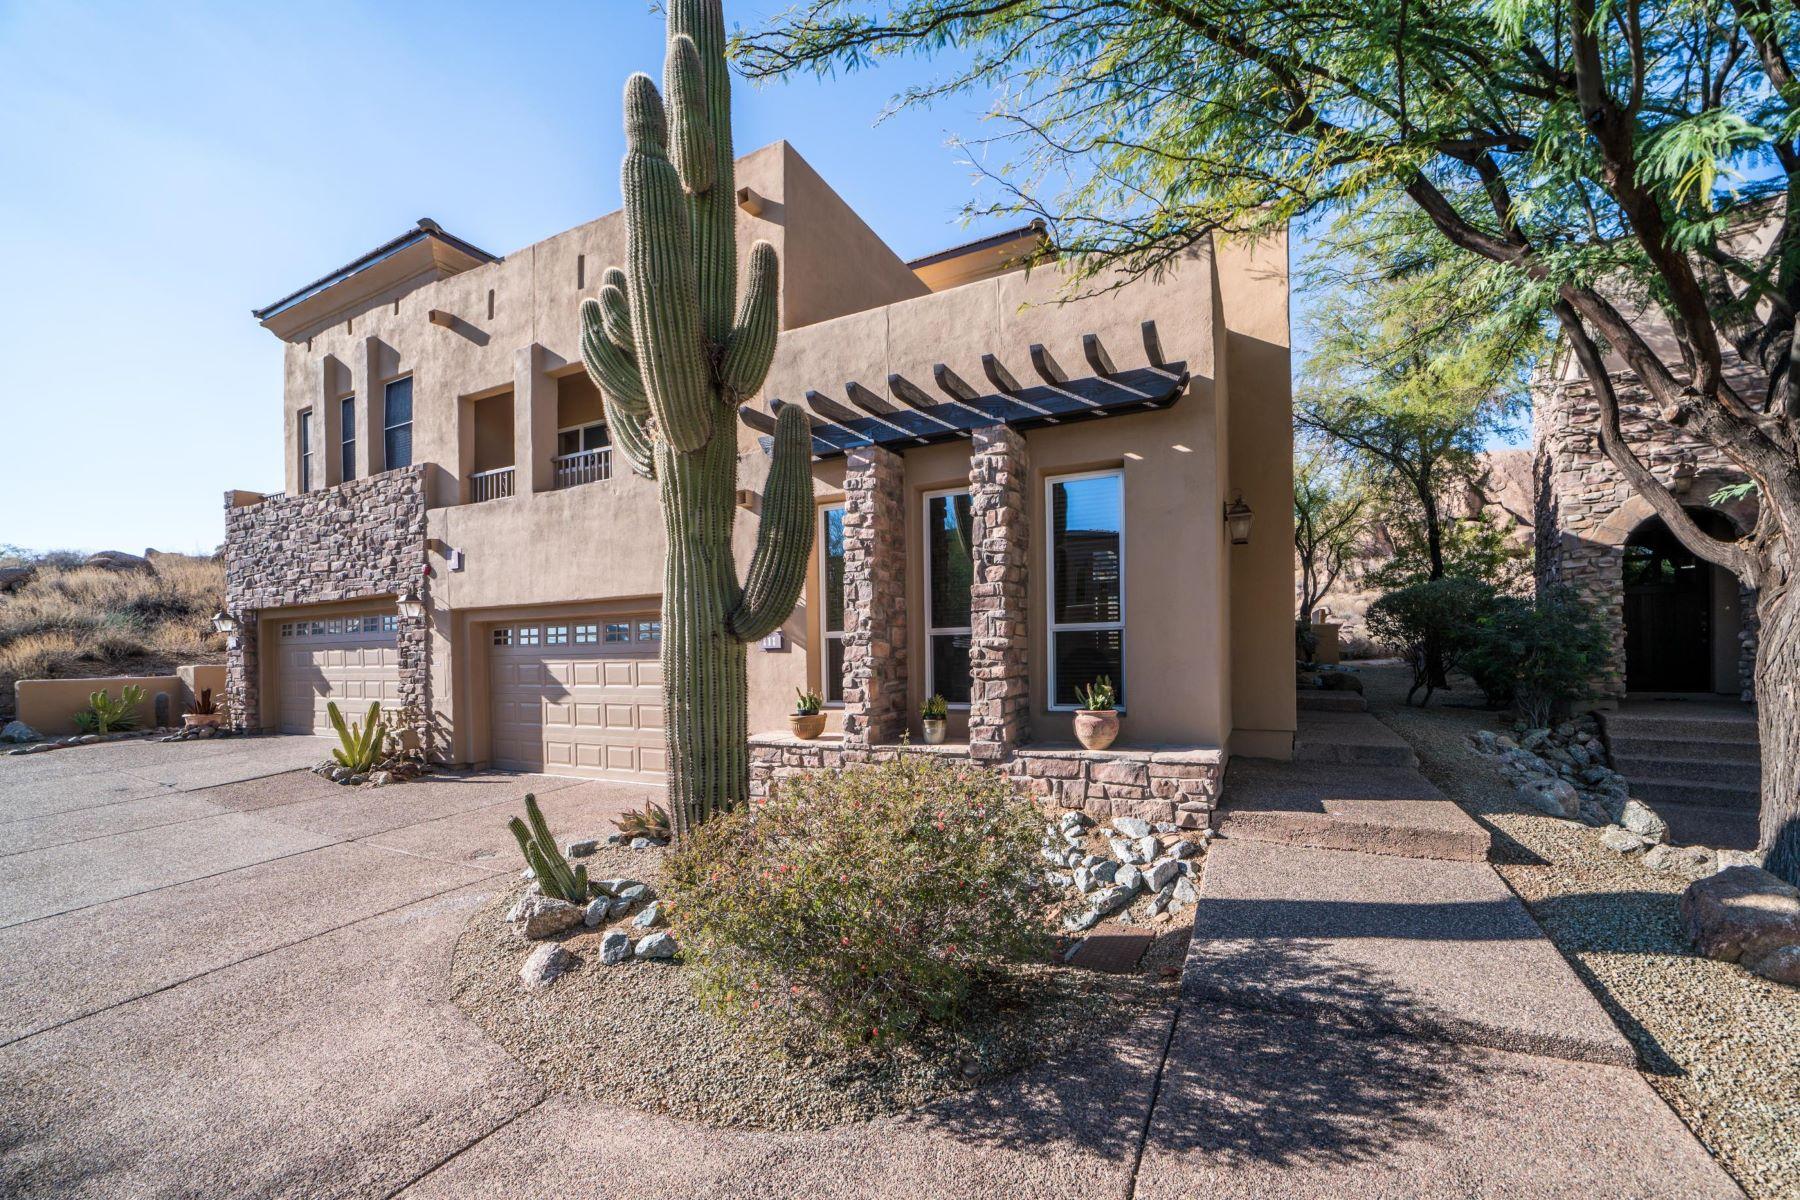 Частный односемейный дом для того Продажа на Incredible Home in Perfect Location 28990 N White Feather LN 111, Scottsdale, Аризона, 85262 Соединенные Штаты